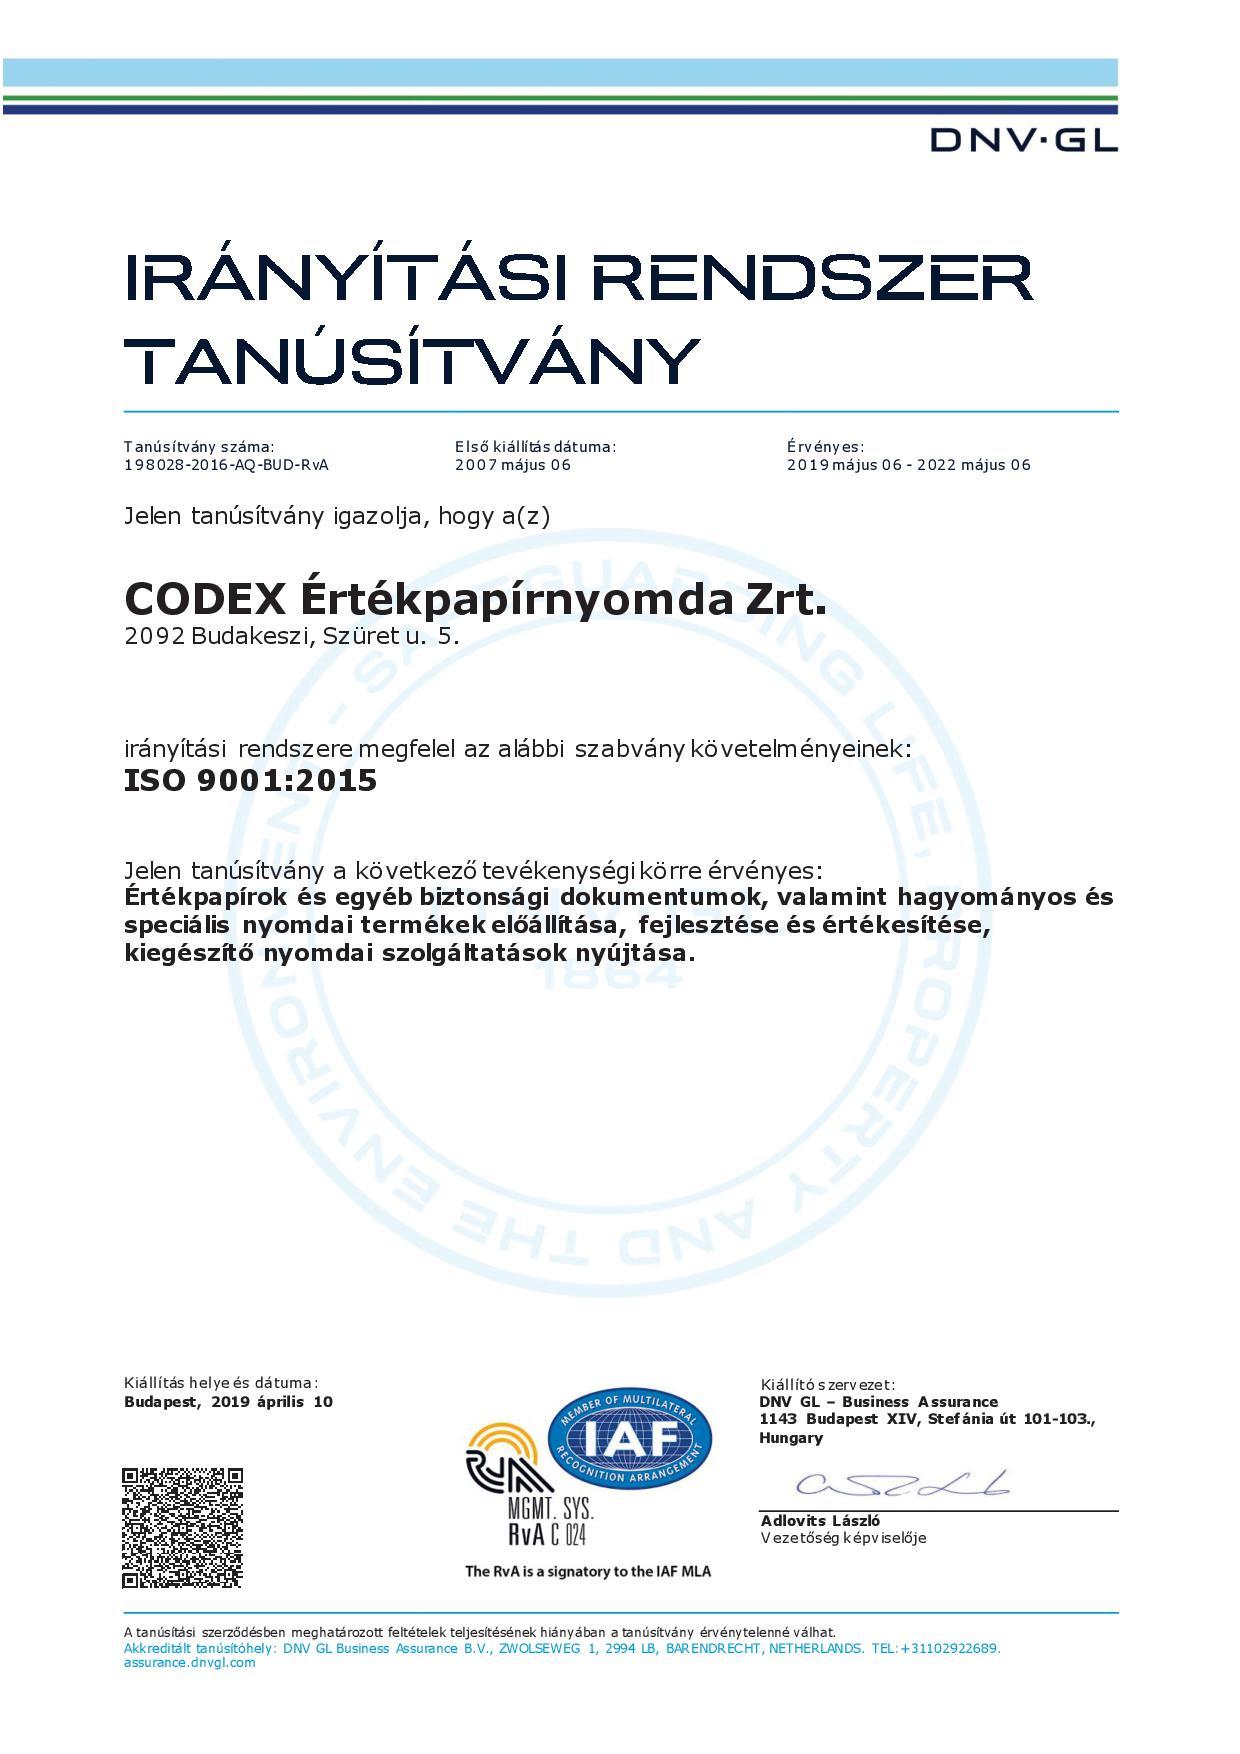 DNV GL certificate 9001